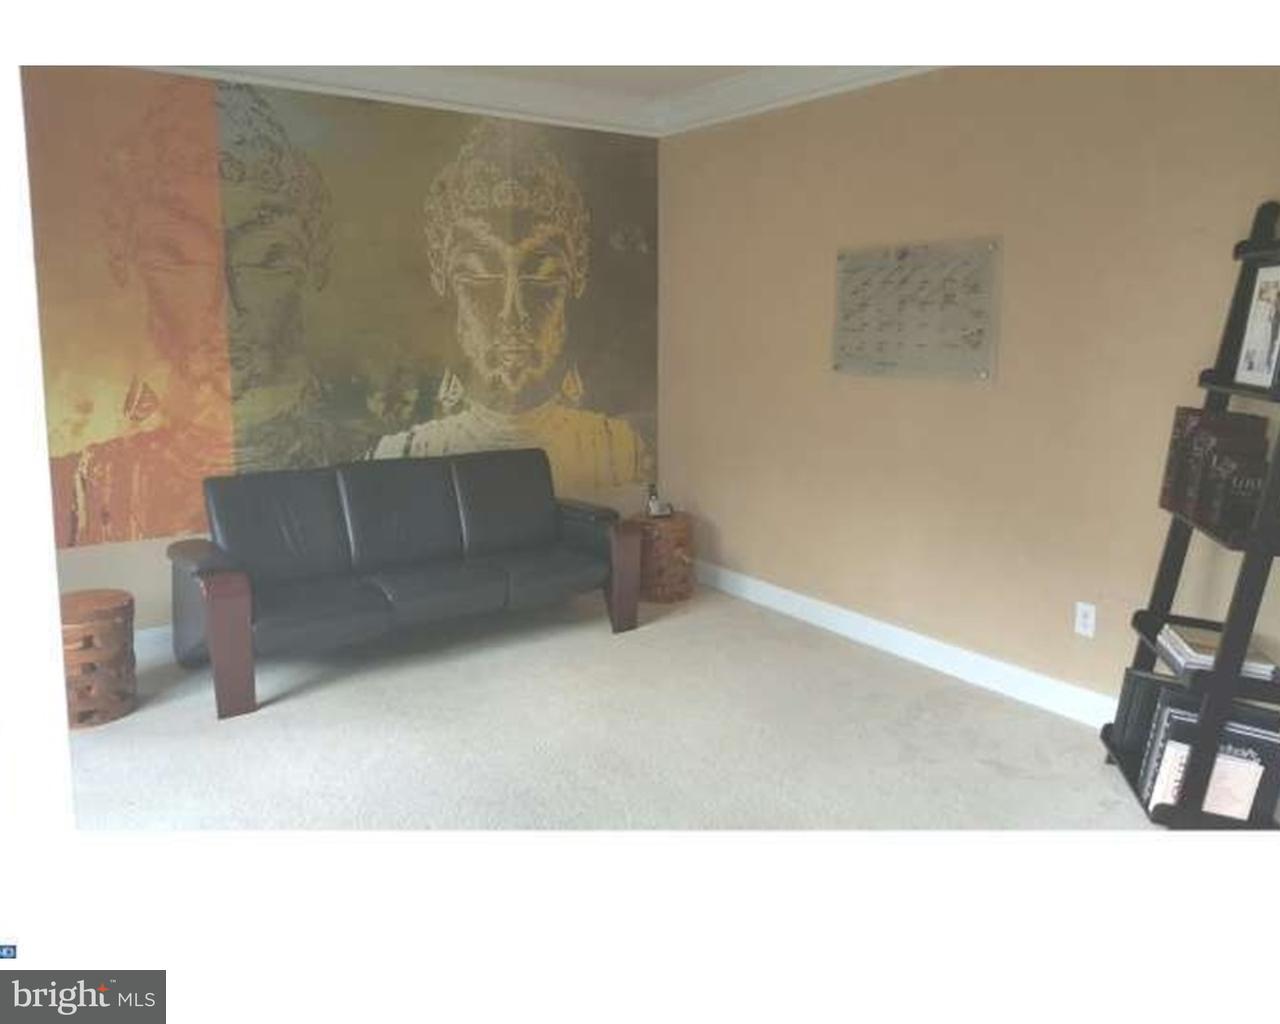 2324 S WHITTMORE ST, FURLONG - Listed at $2,550, FURLONG